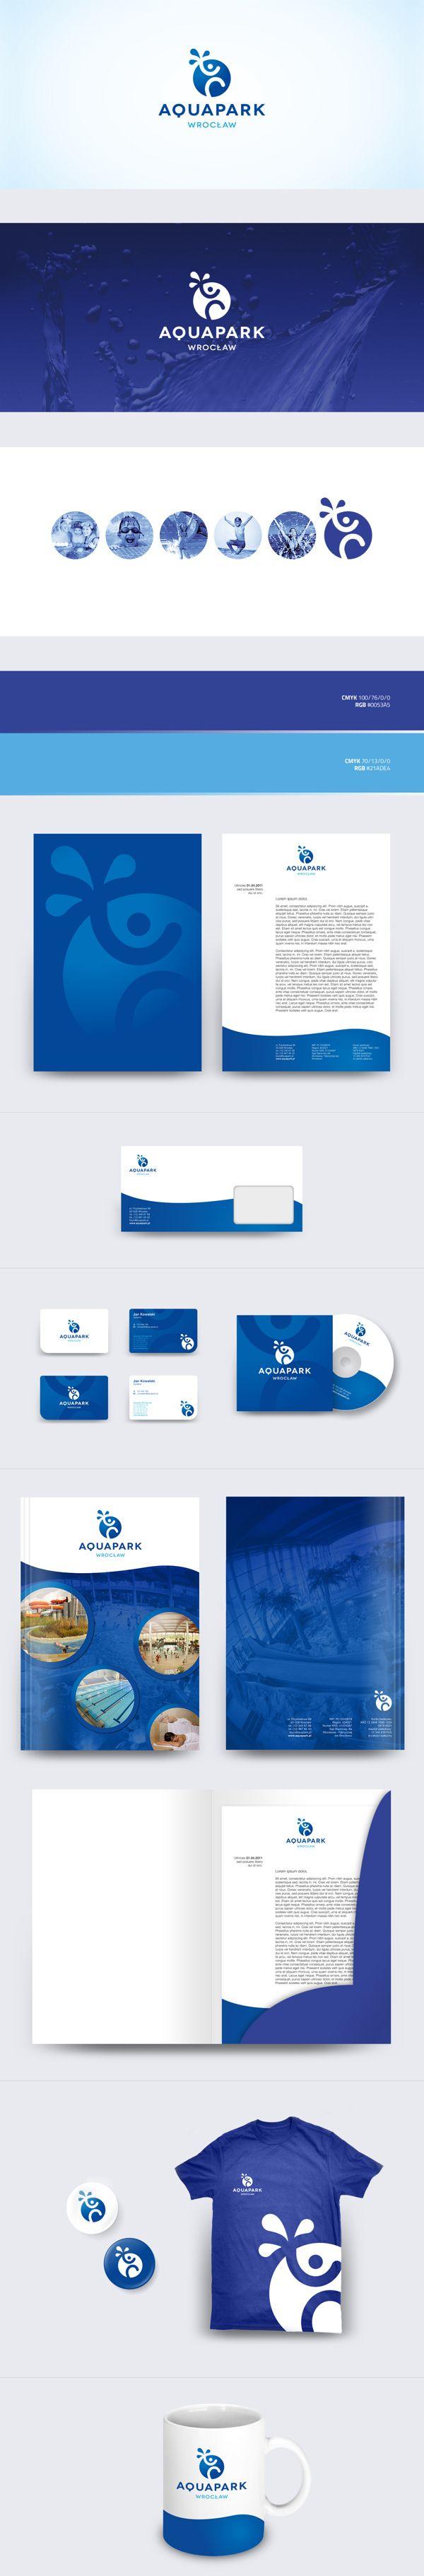 Aquapark Wrocław branding | #stationary #corporate #design #corporatedesign #identity #branding #marketing < repinned by www.BlickeDeeler.de | Take a look at www.LogoGestaltung-Hamburg.de